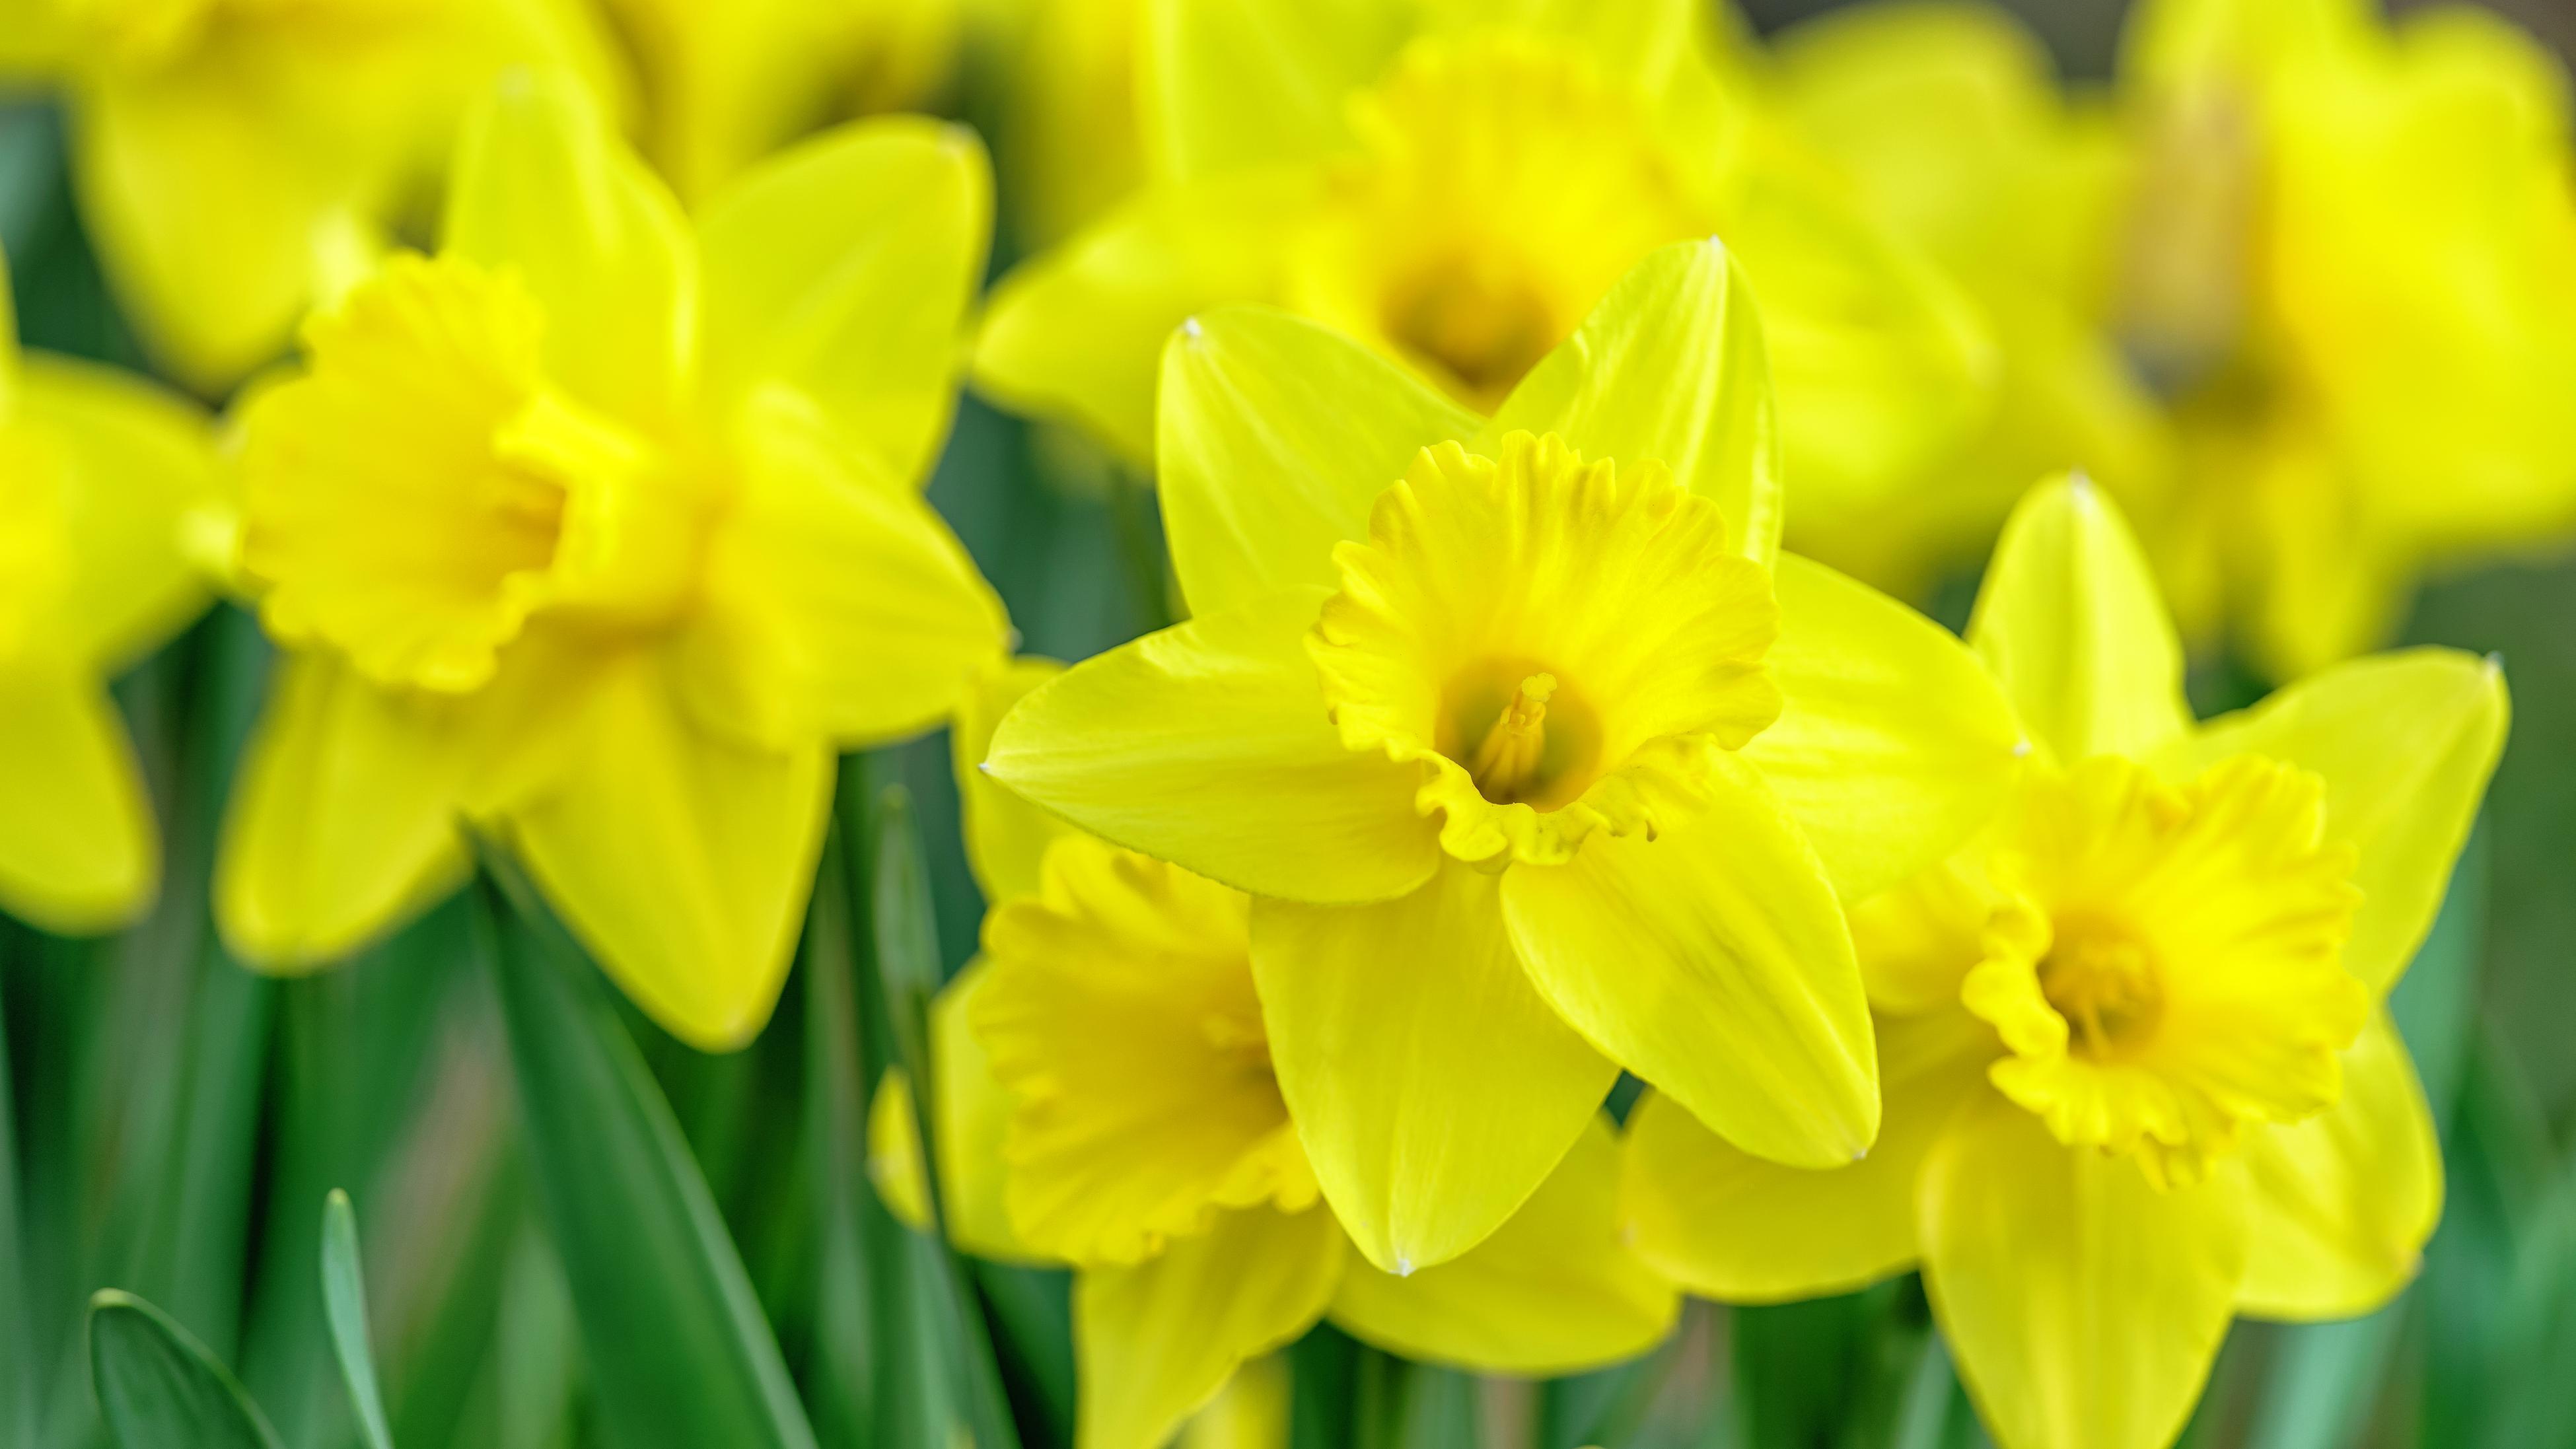 Yellow daffodil flowers